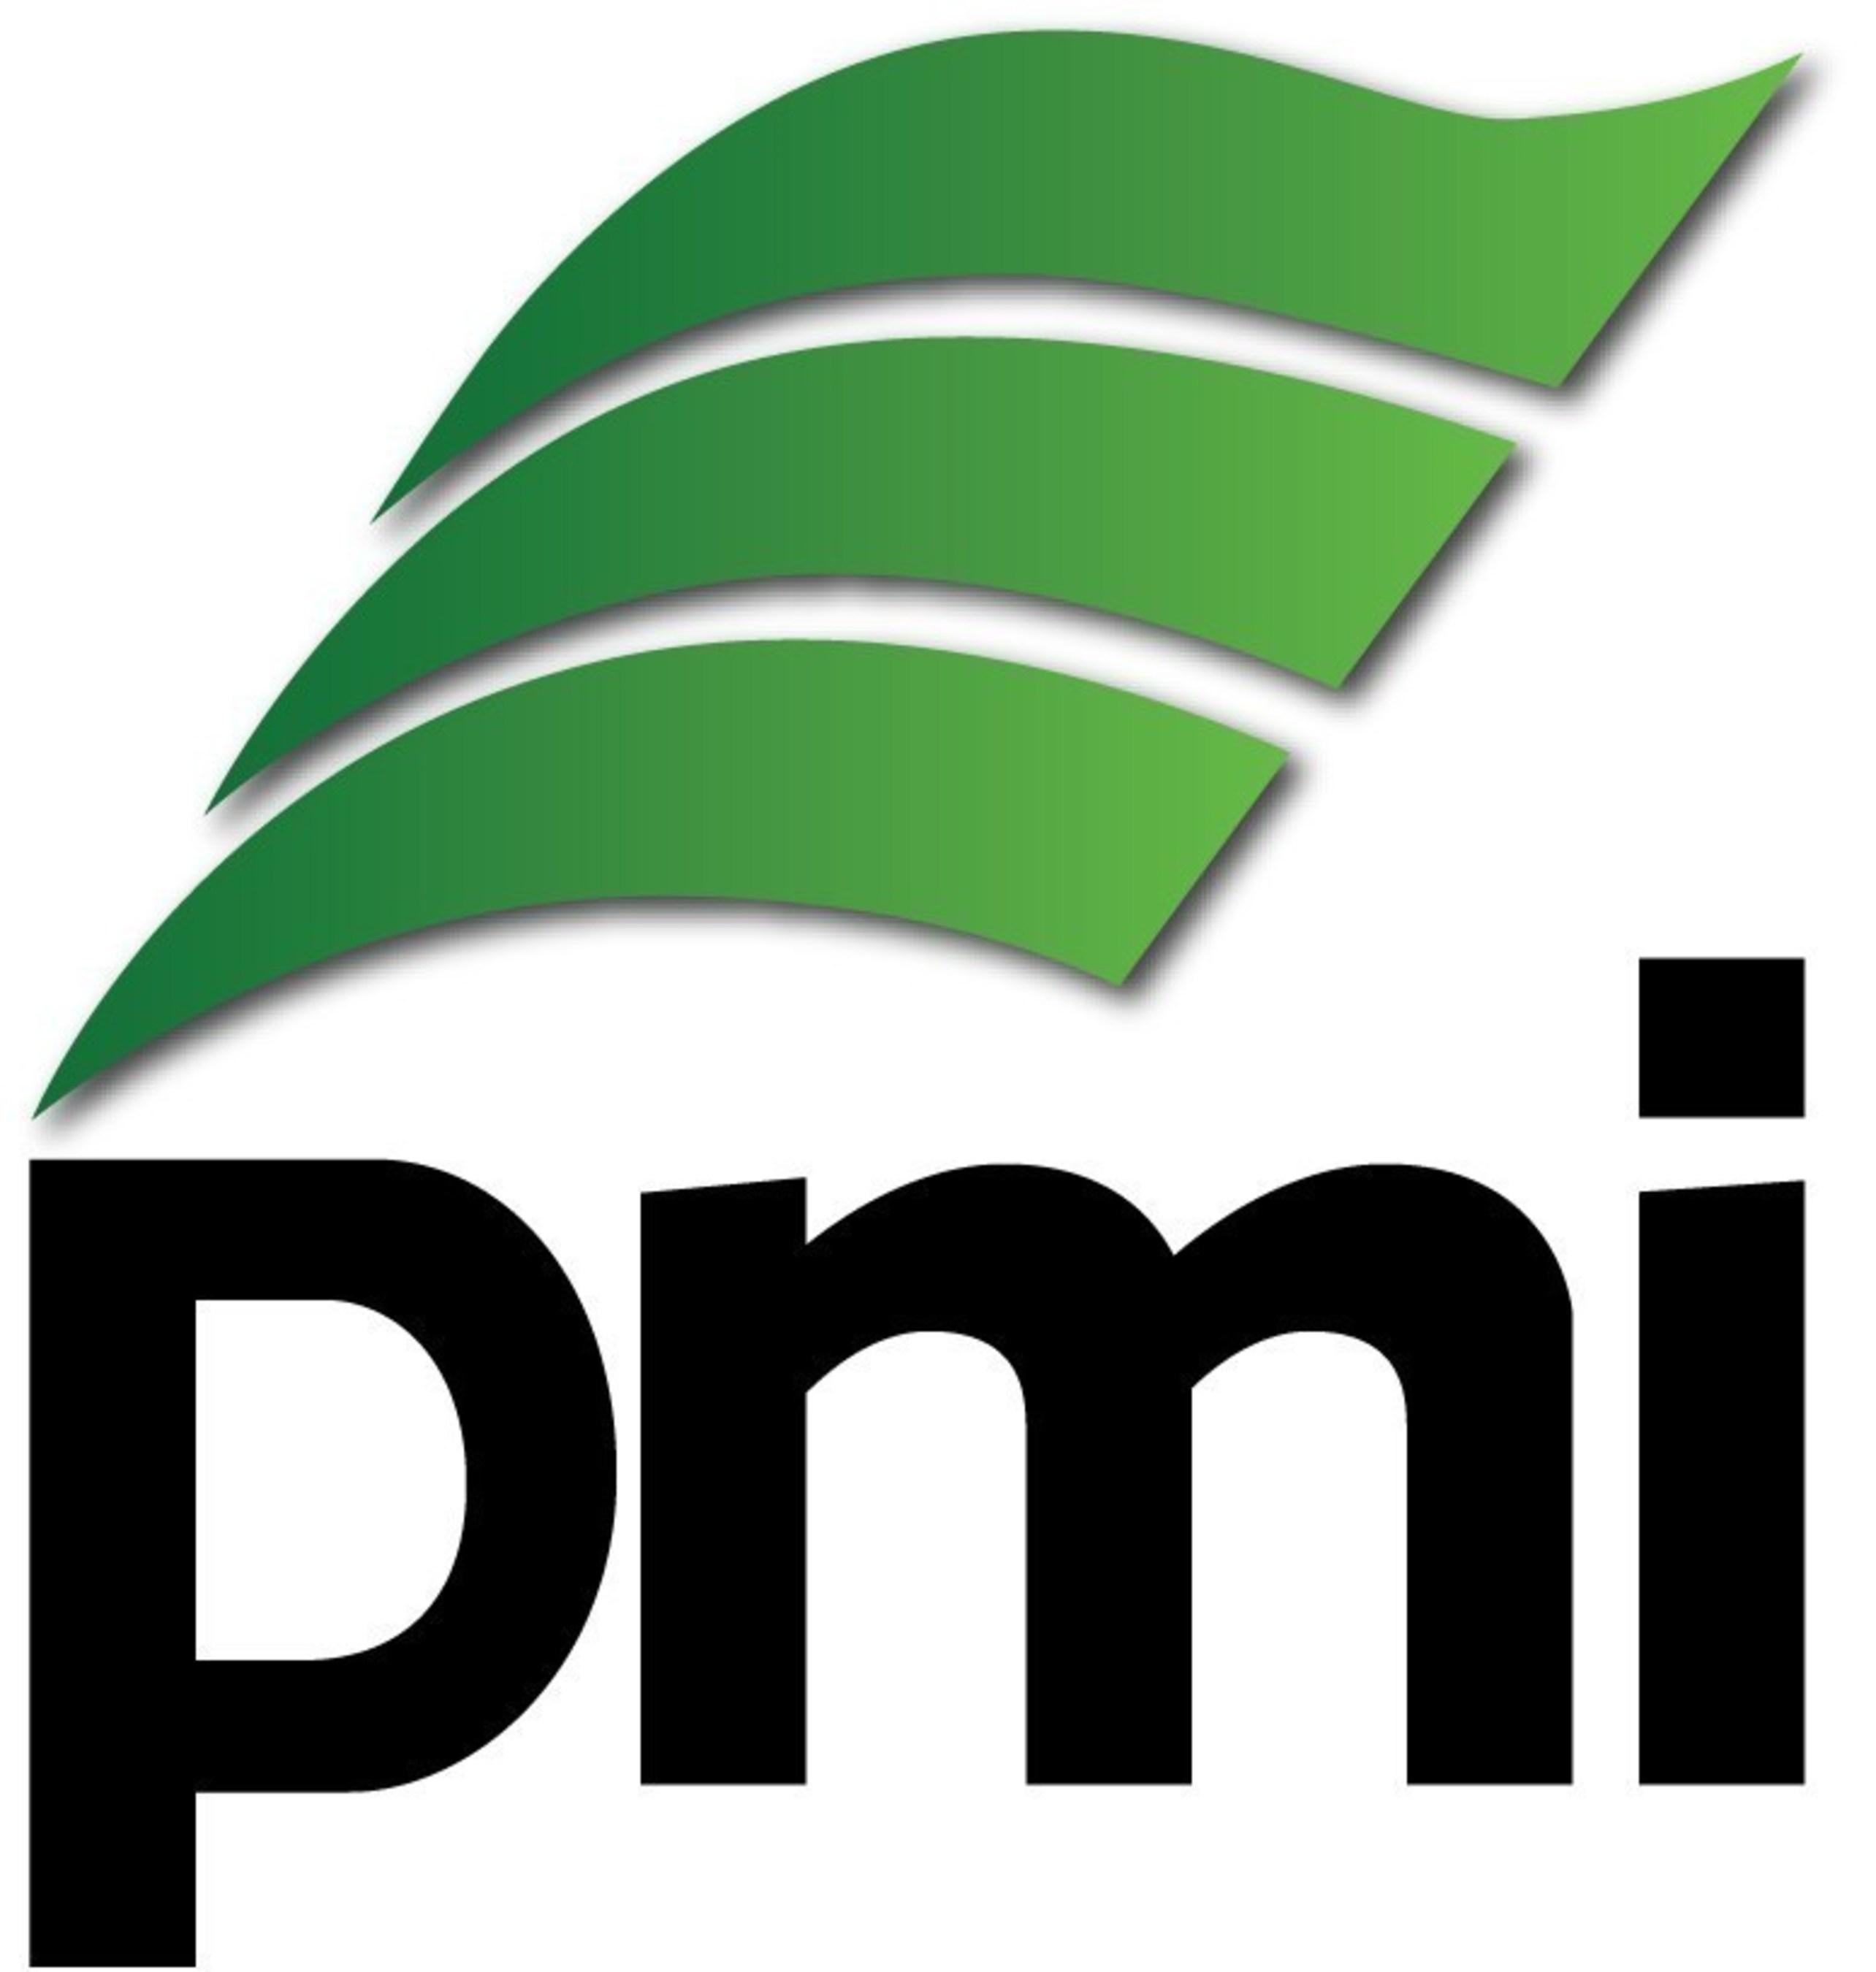 PMFI Adopts Cleantech Focus